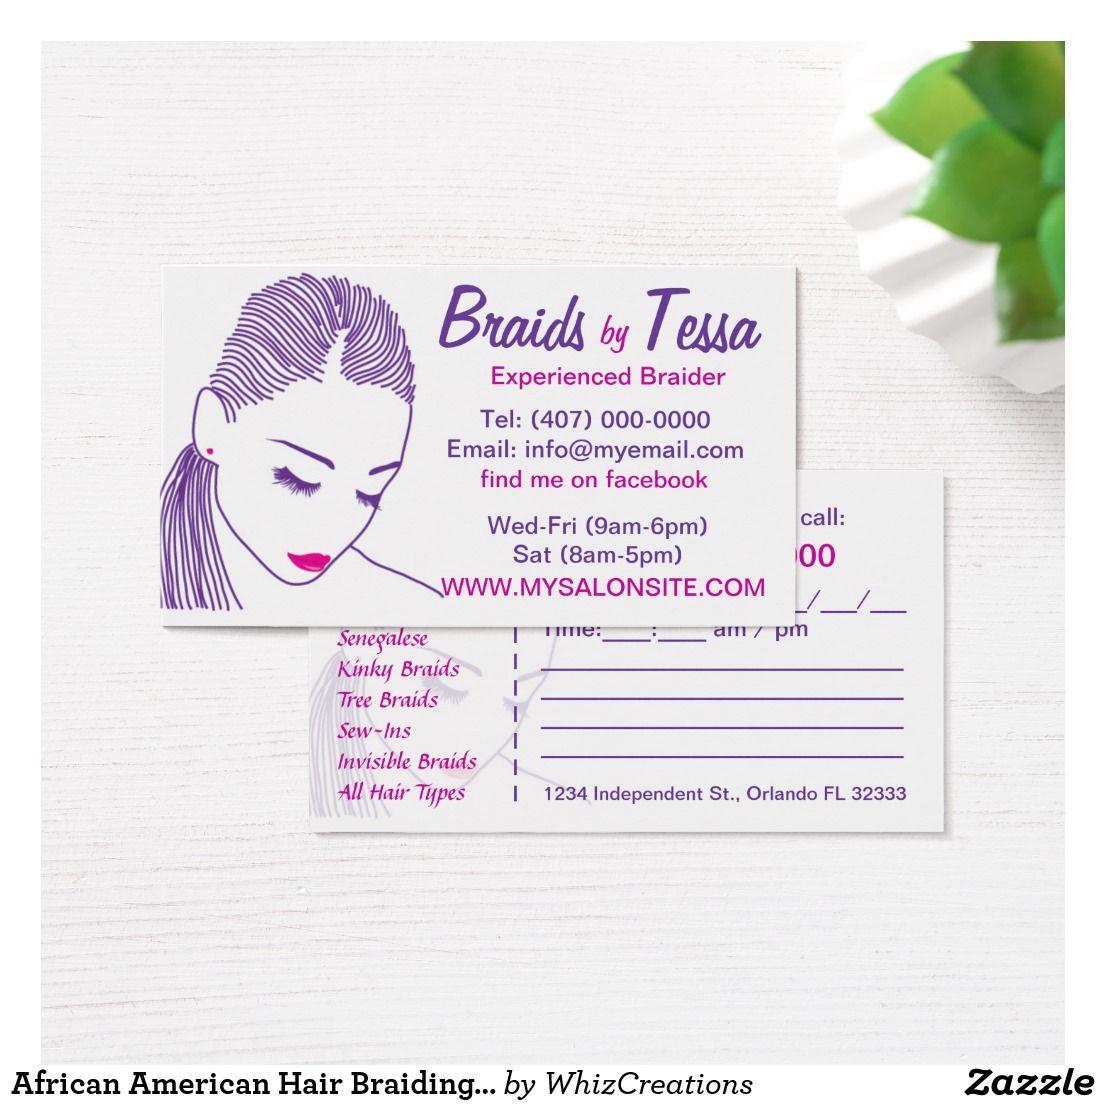 African American Hair Braiding Salon Business Card Zazzle Com African American Braided Hairstyles Salon Business Cards African American Hairstyles